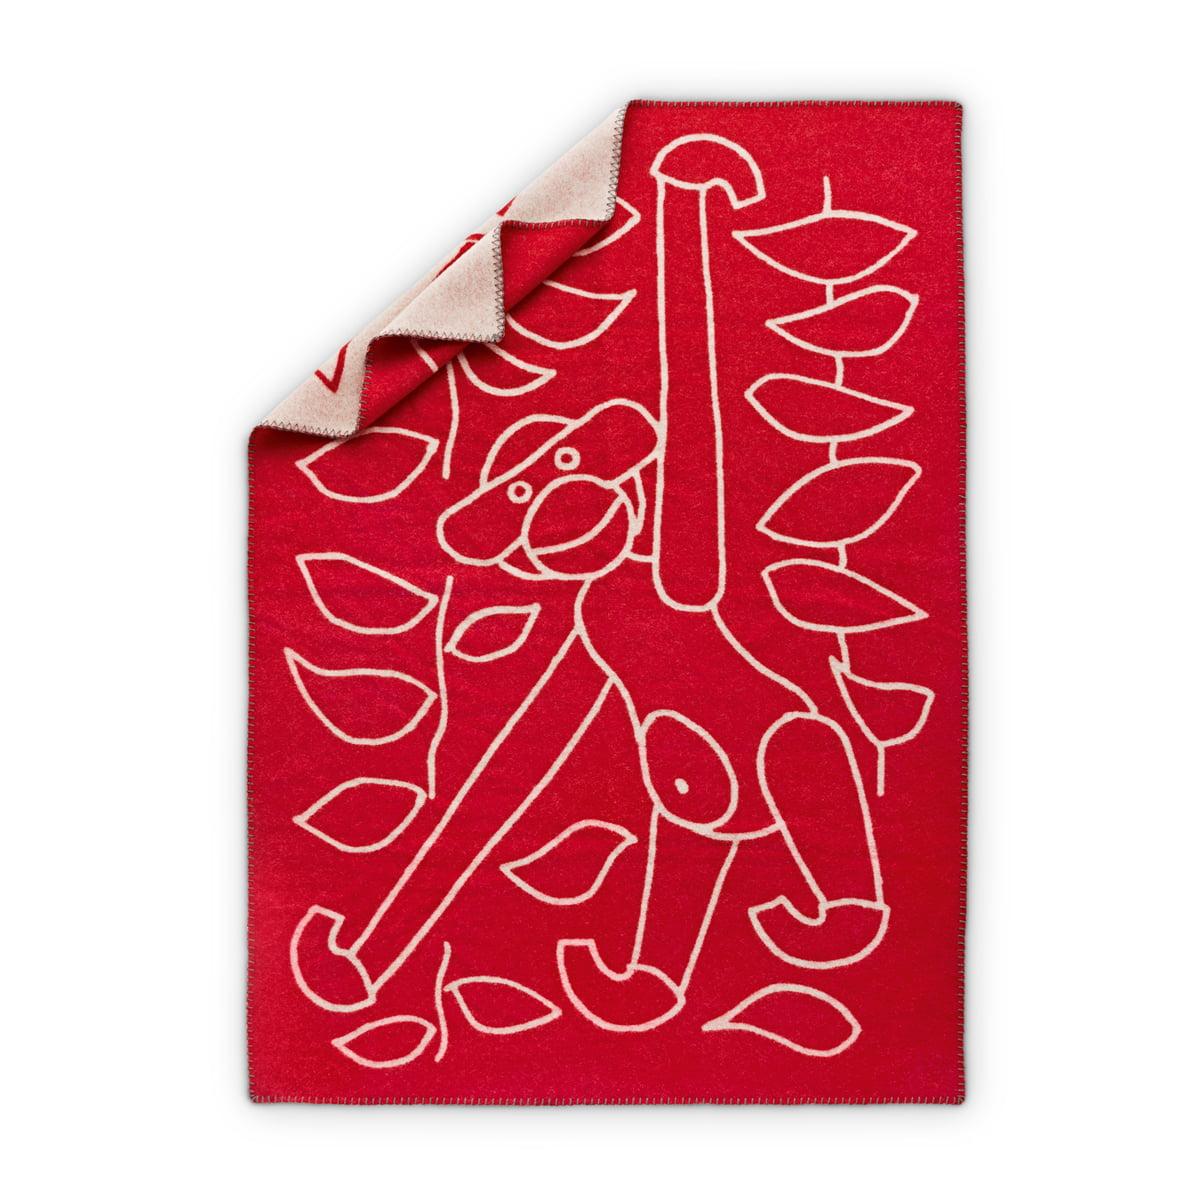 Kinderdecke 80 x 120 cm, rot